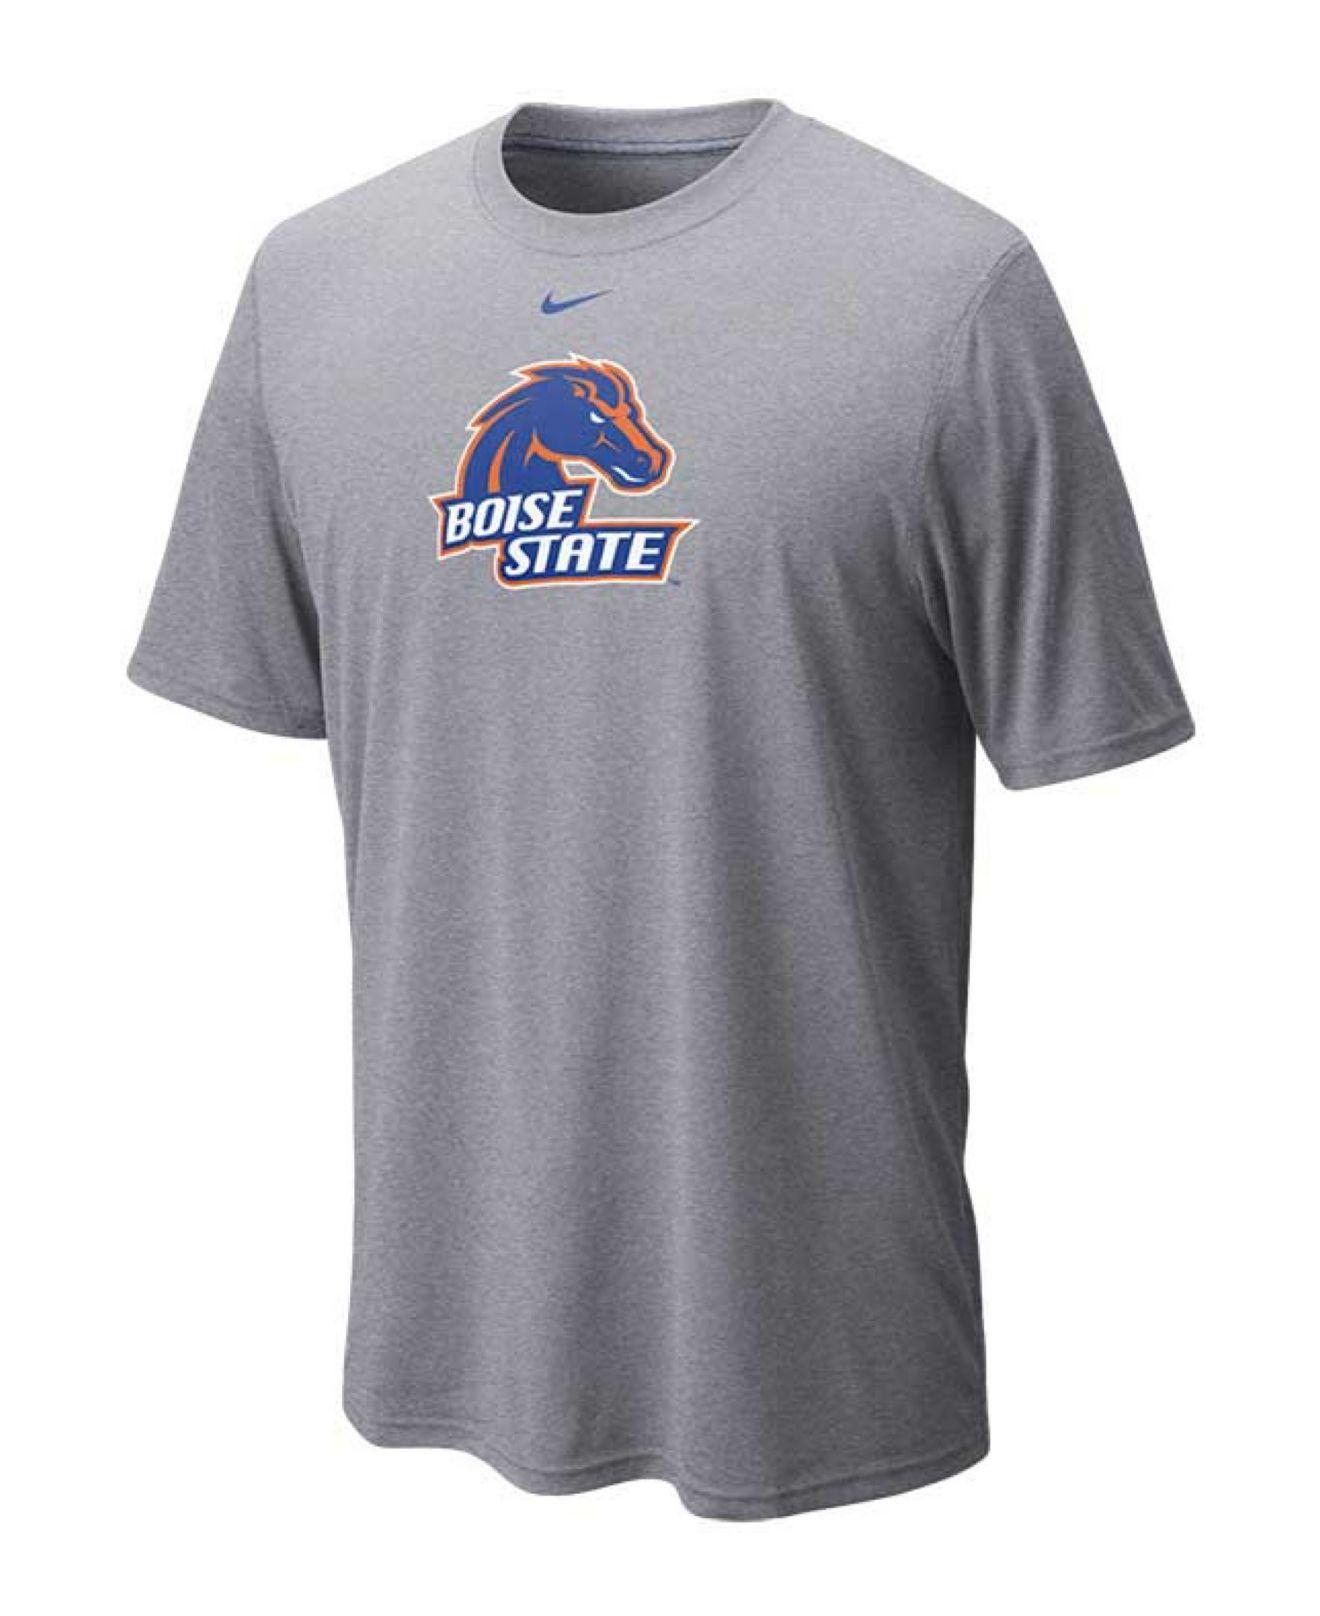 Nike men 39 s boise state broncos dri fit logo legend t shirt for Boise t shirt printing